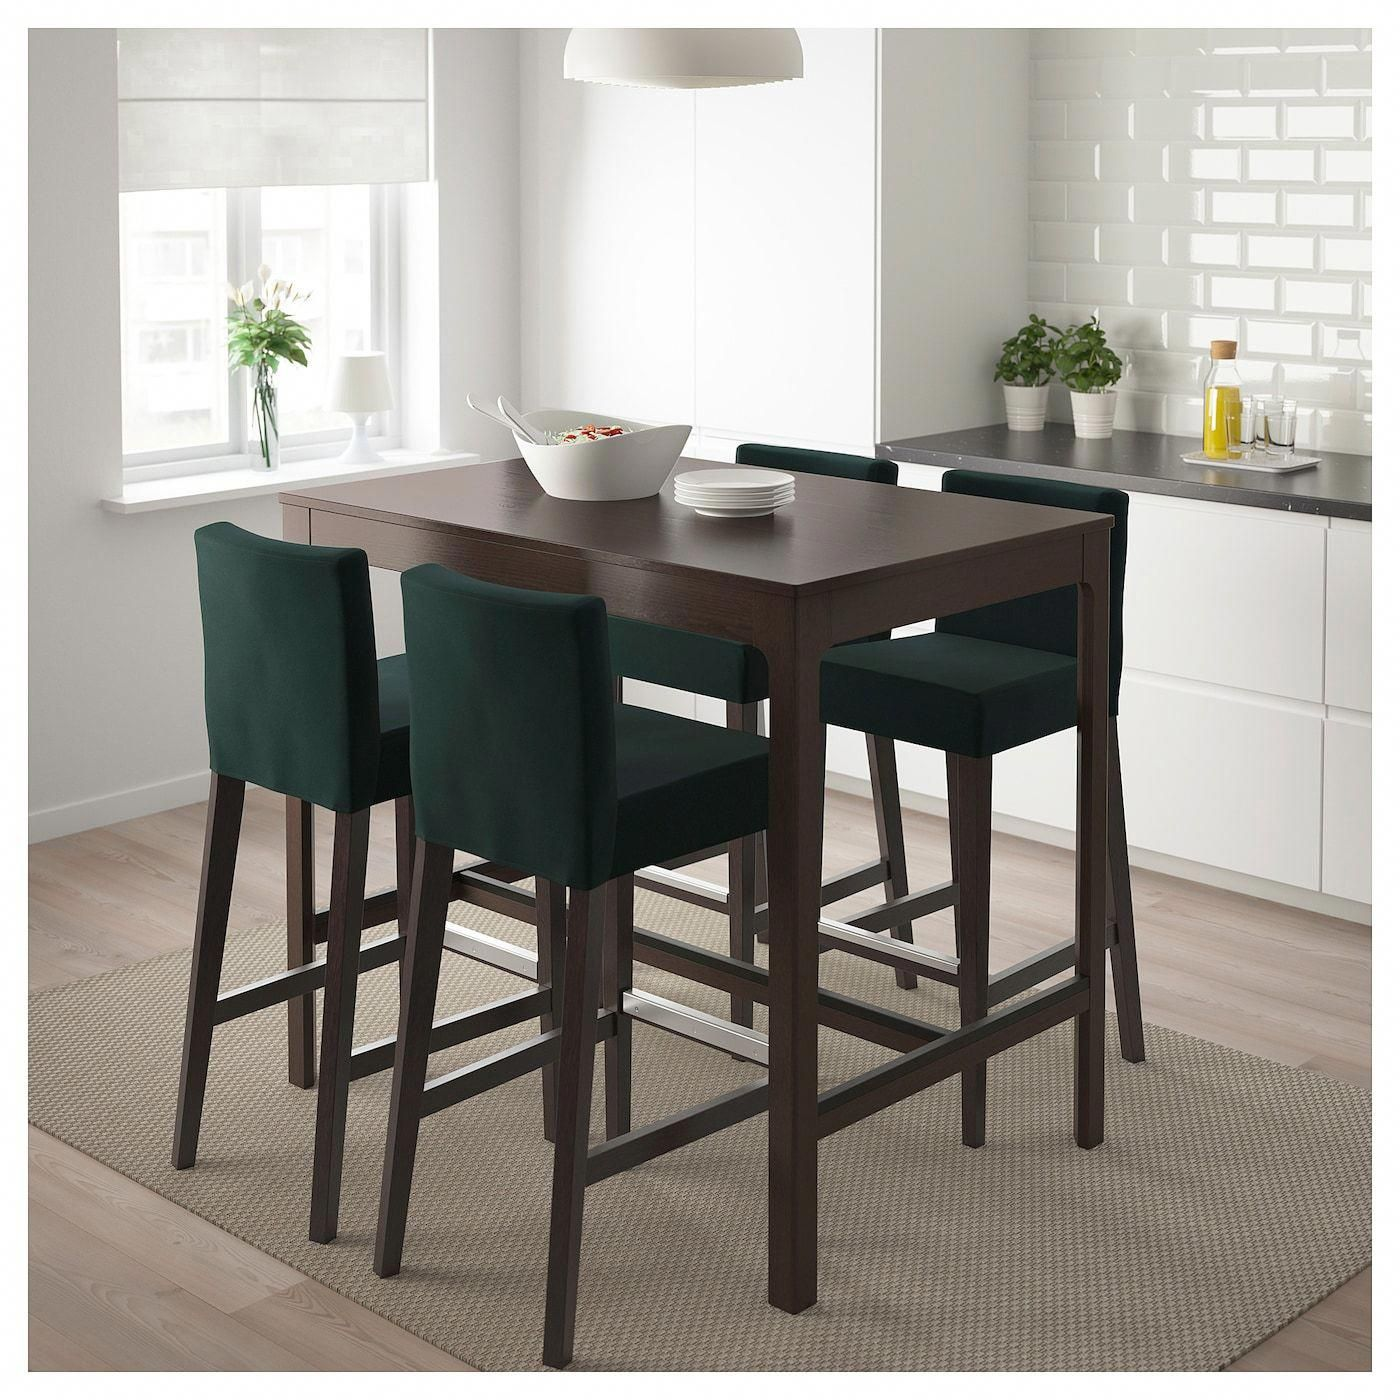 Ekedalen Bar Table Dark Brown Ikea In 2021 High Dining Table Bar Height Dining Table High Table And Chairs